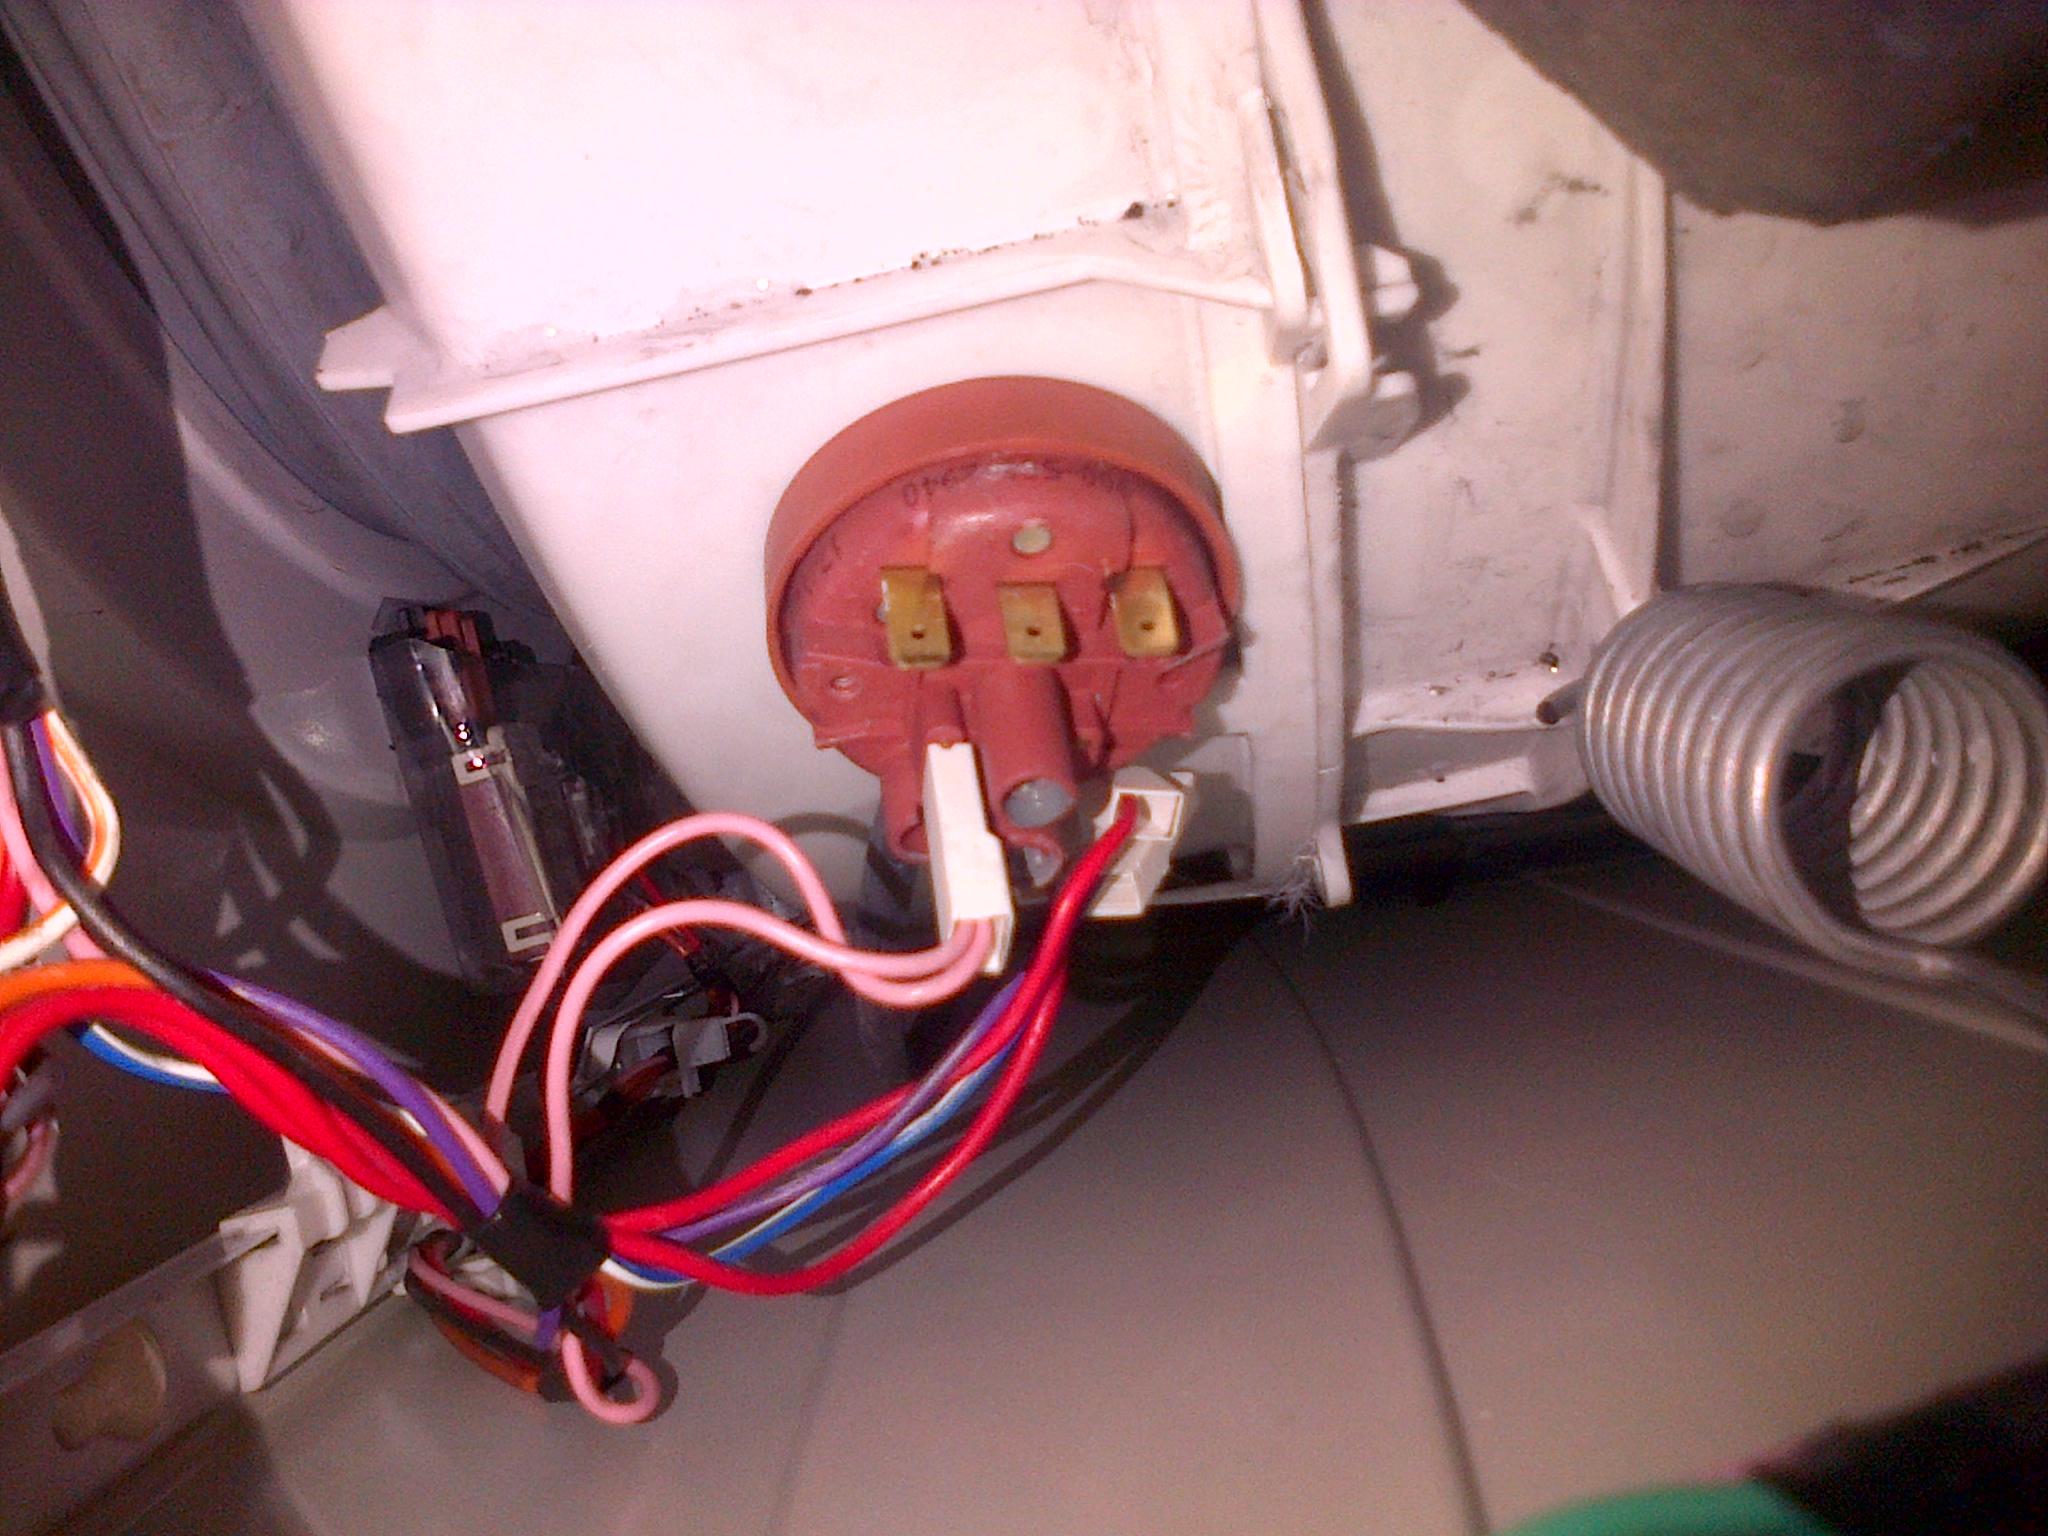 Beko wm5100w pressure valve?